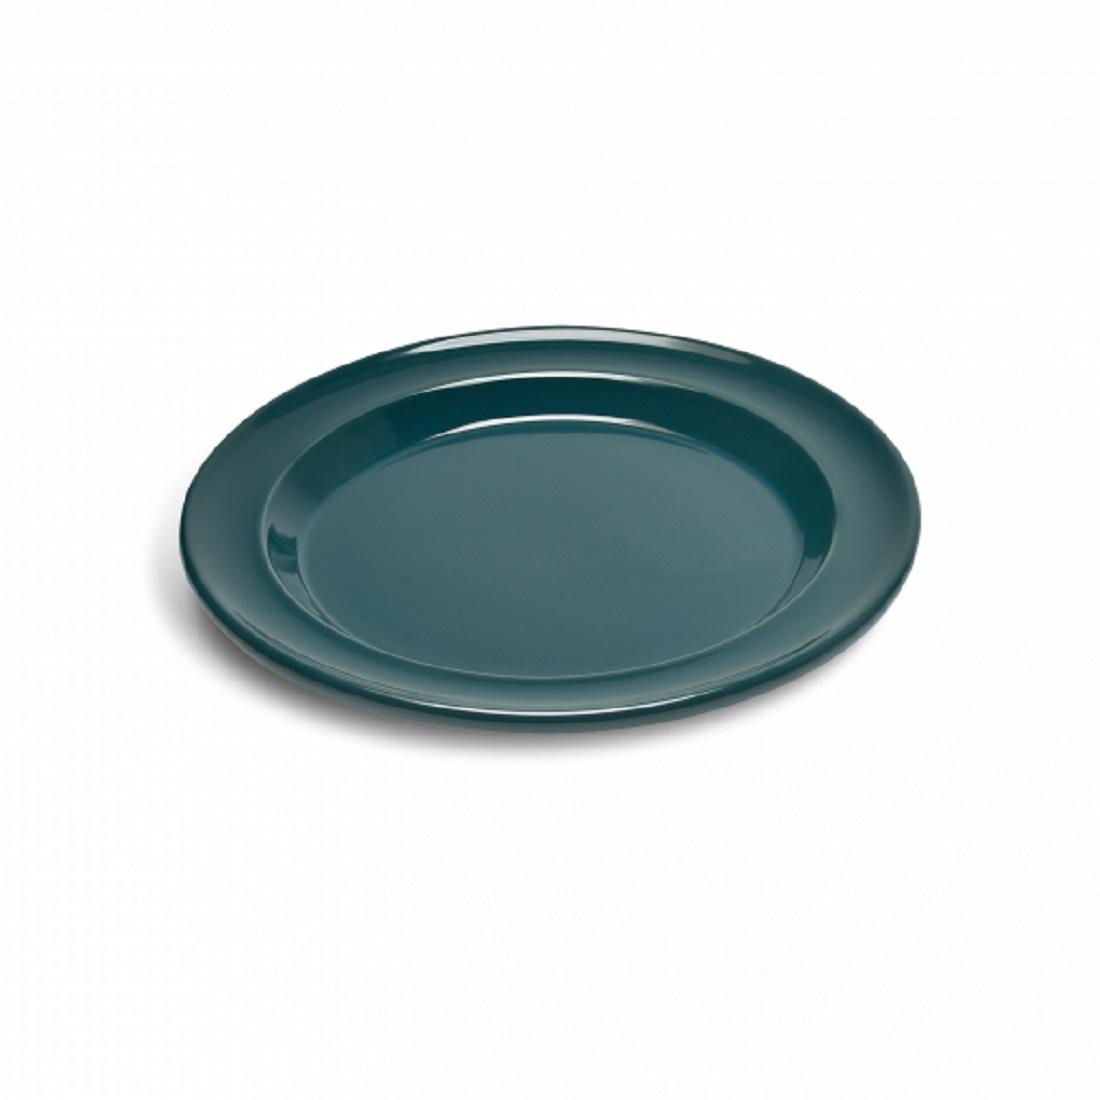 Онлайн каталог PROMENU: Тарелка десертная/закусочная Emile Henry Tableware, диаметр 21 см, blue flame Emile Henry 978870